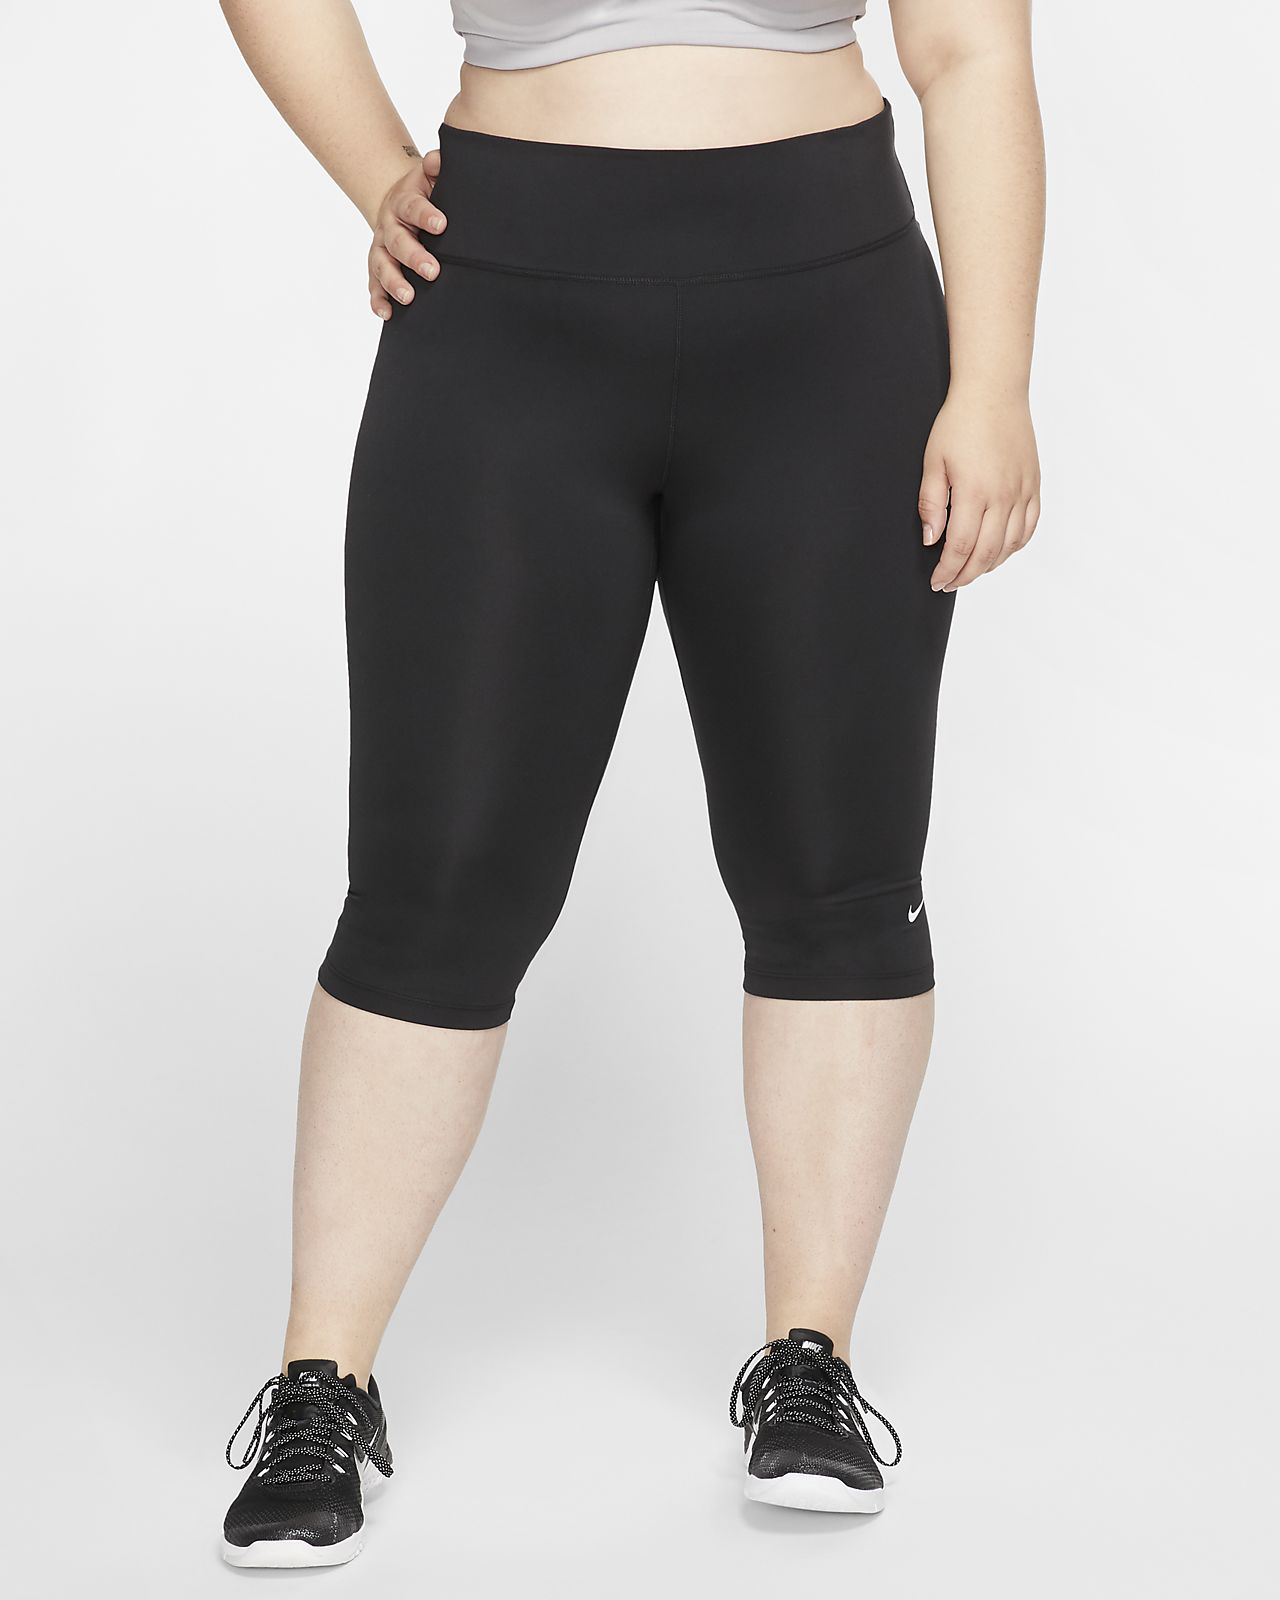 Trekvartsbyxor Nike One för kvinnor (Plus Size)